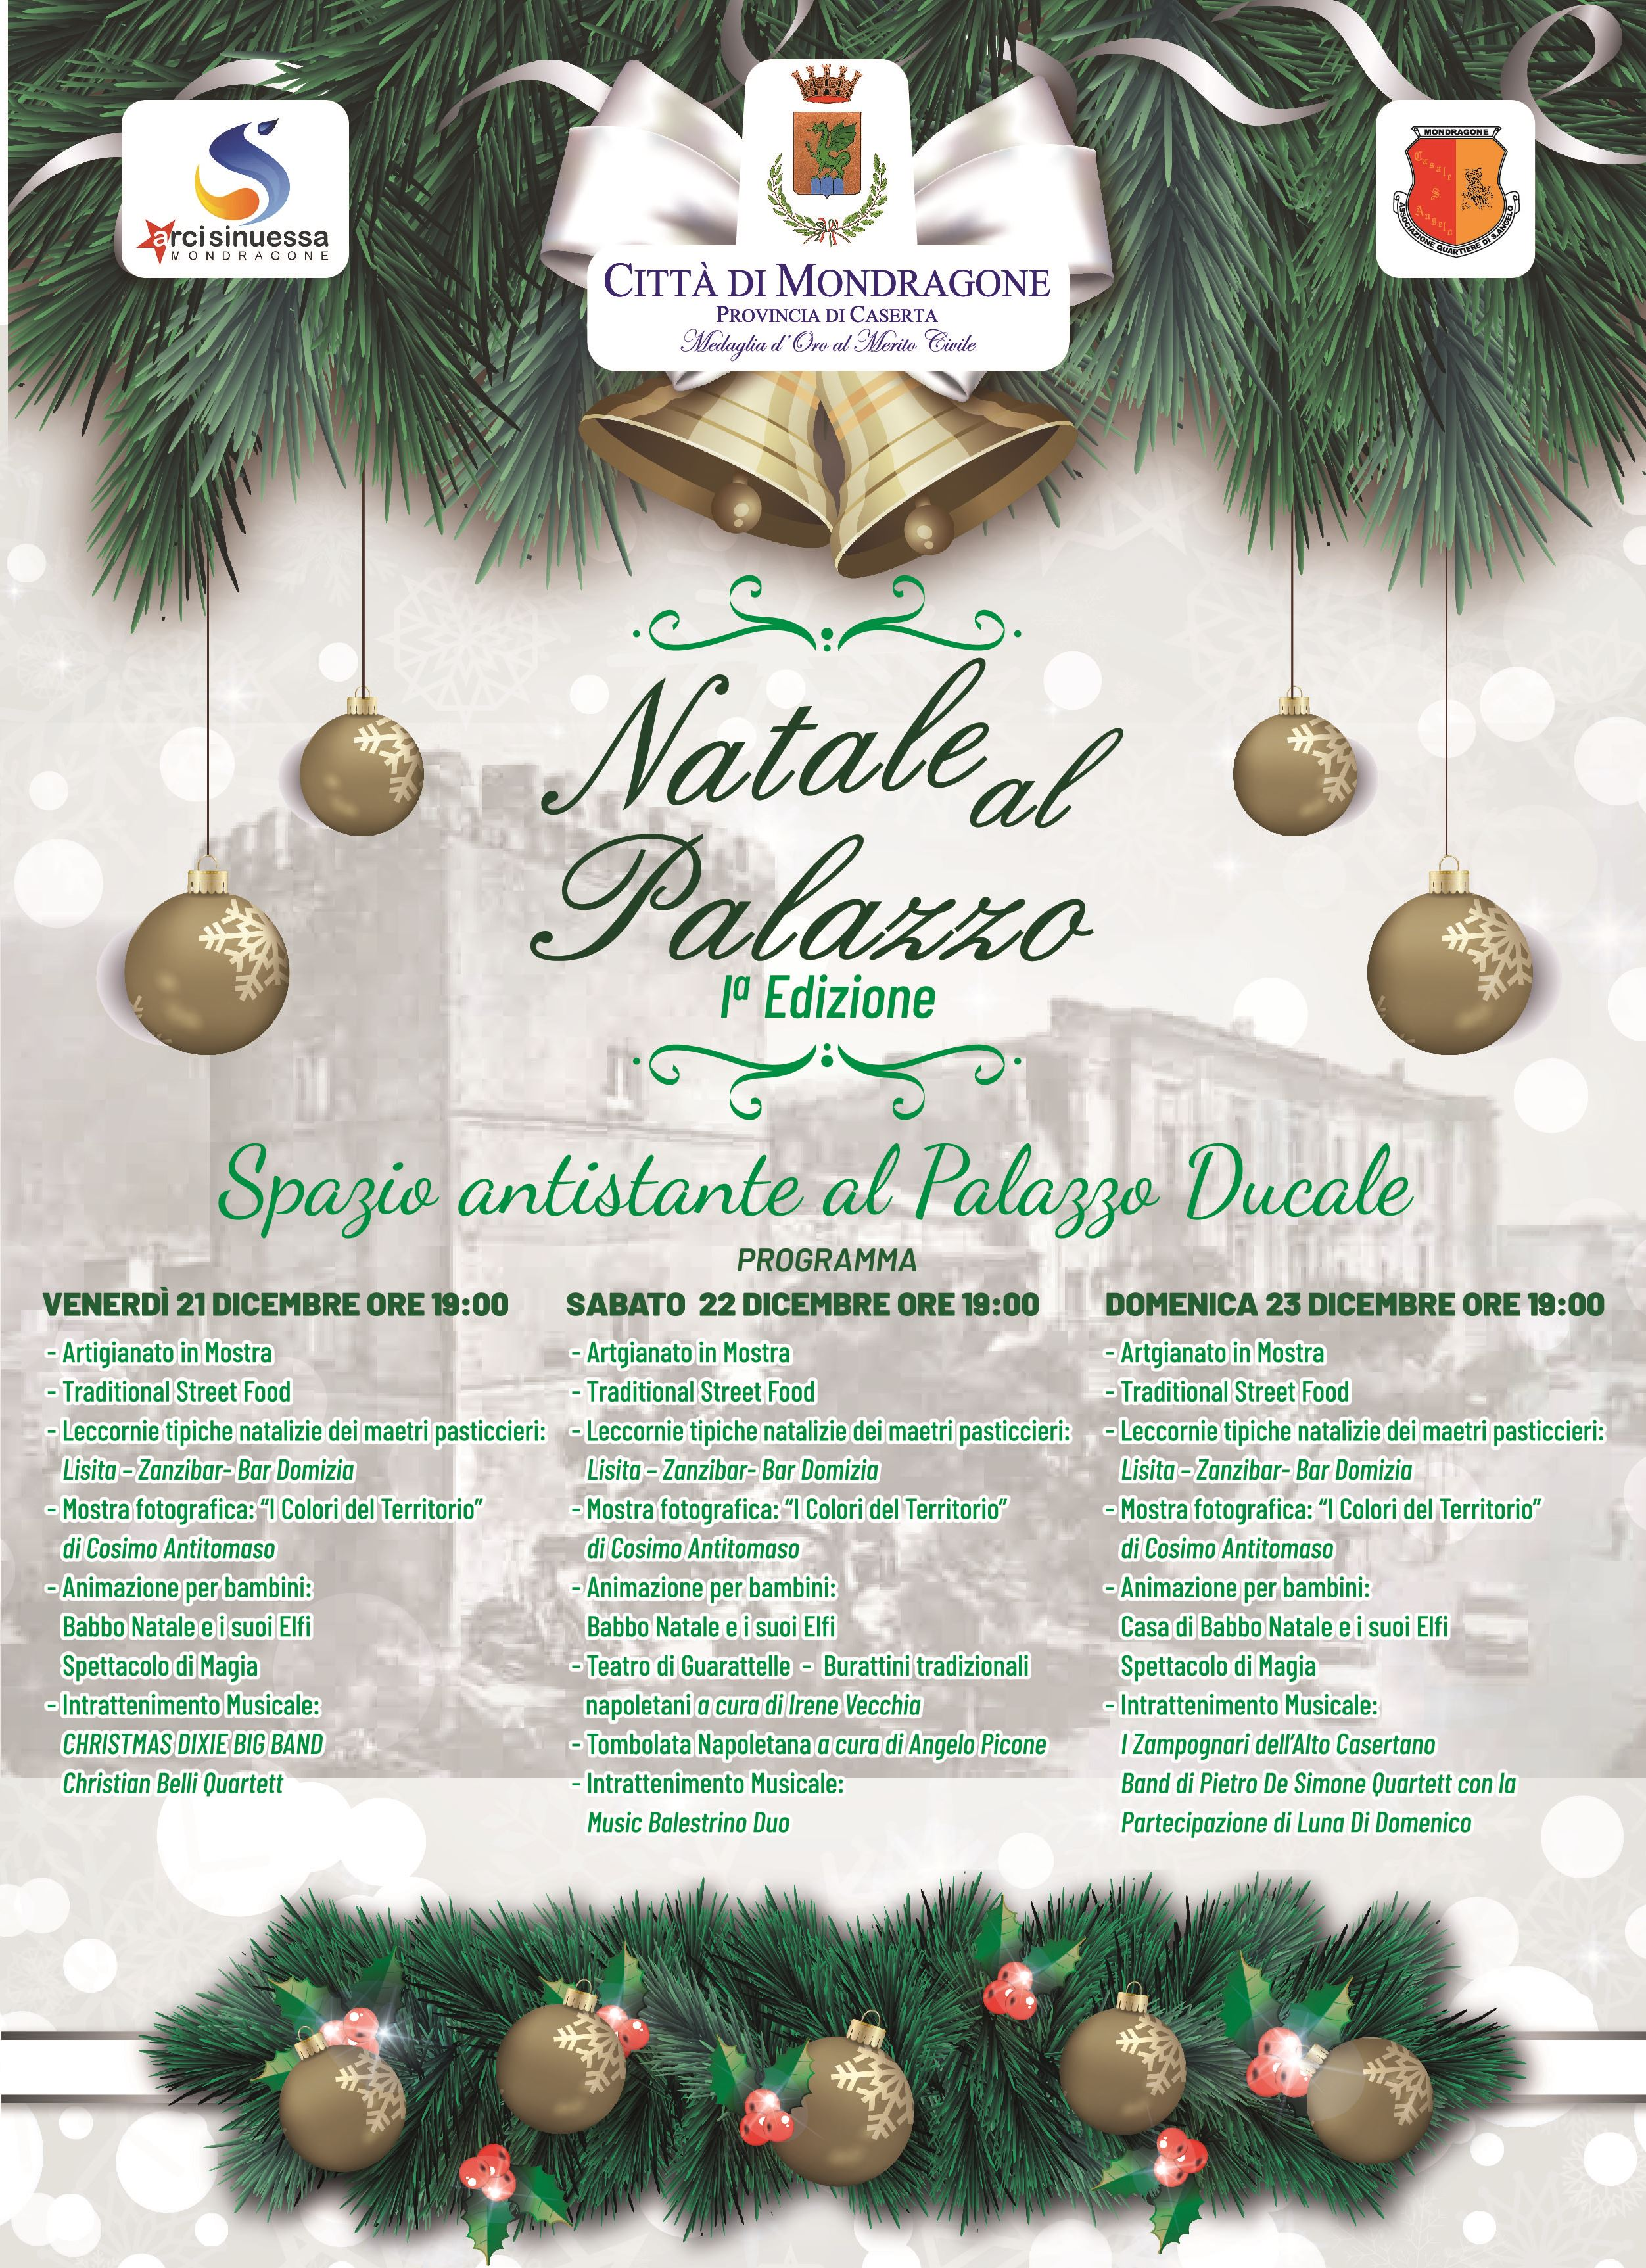 Natale al Palazzo Ducale 2018